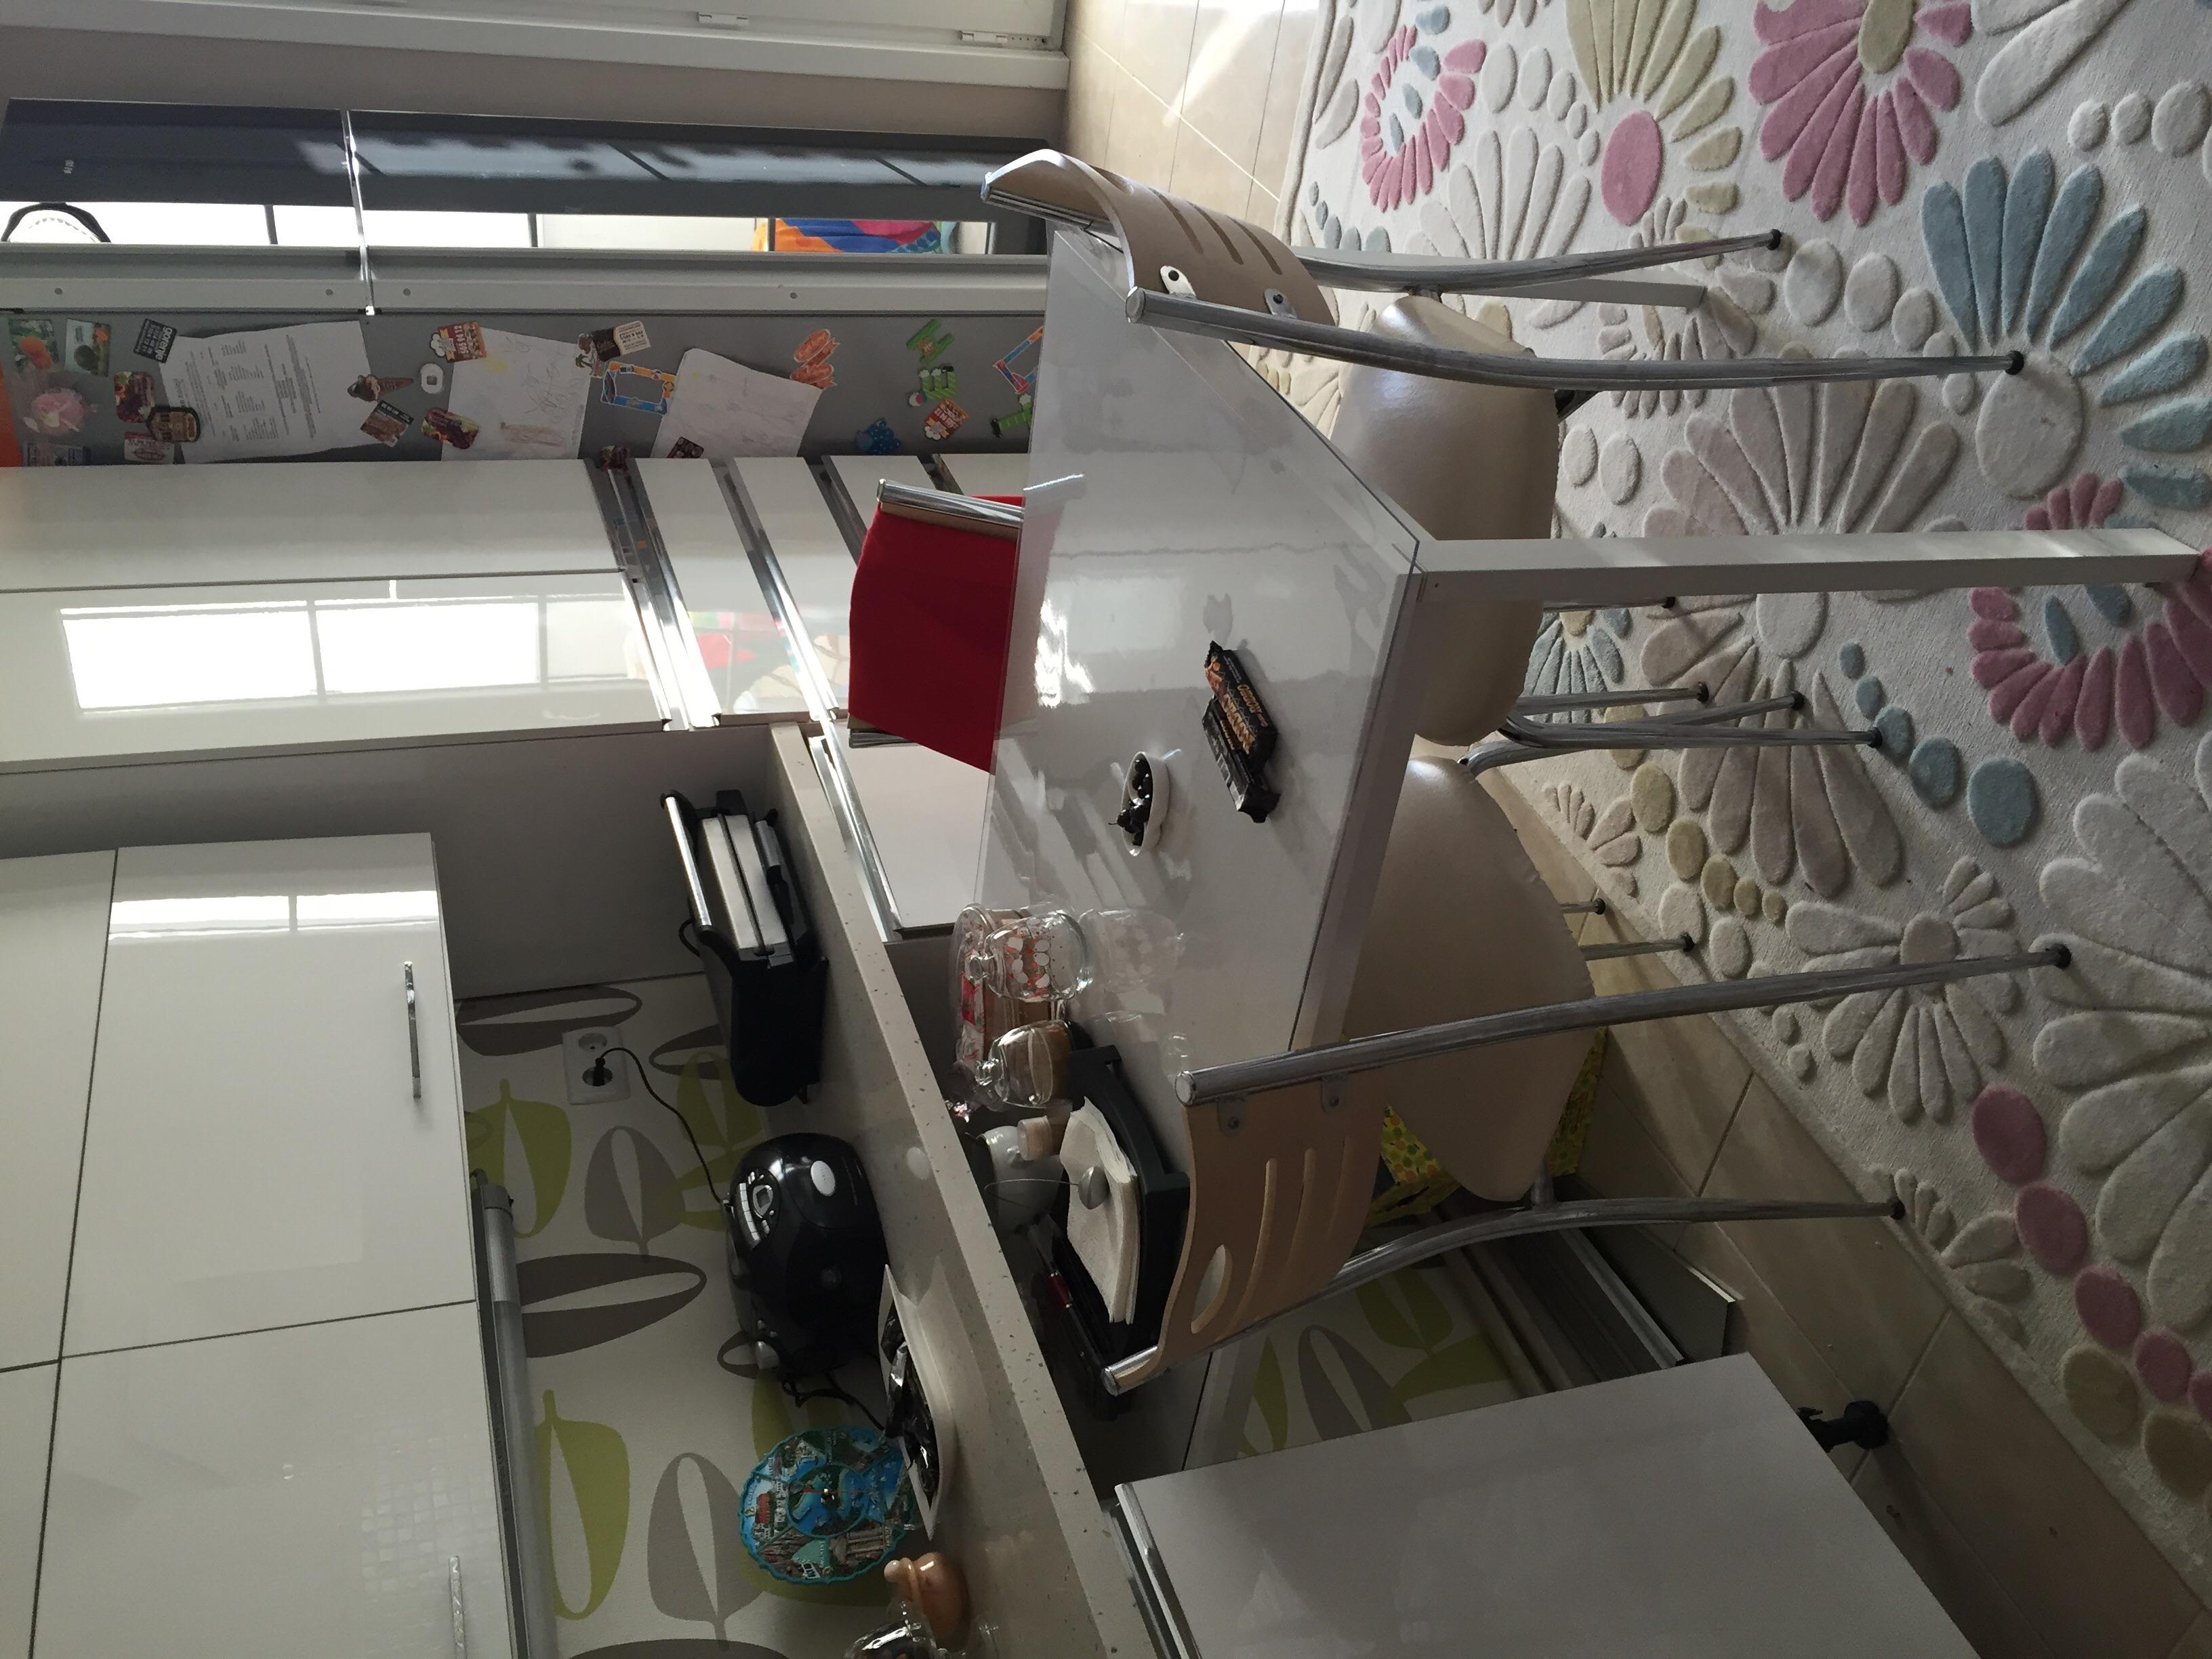 Verkoop 4 slaapkamers atasehir stanbul turkije mran ye atakent mahallesi - Keuken volledige verkoop ...